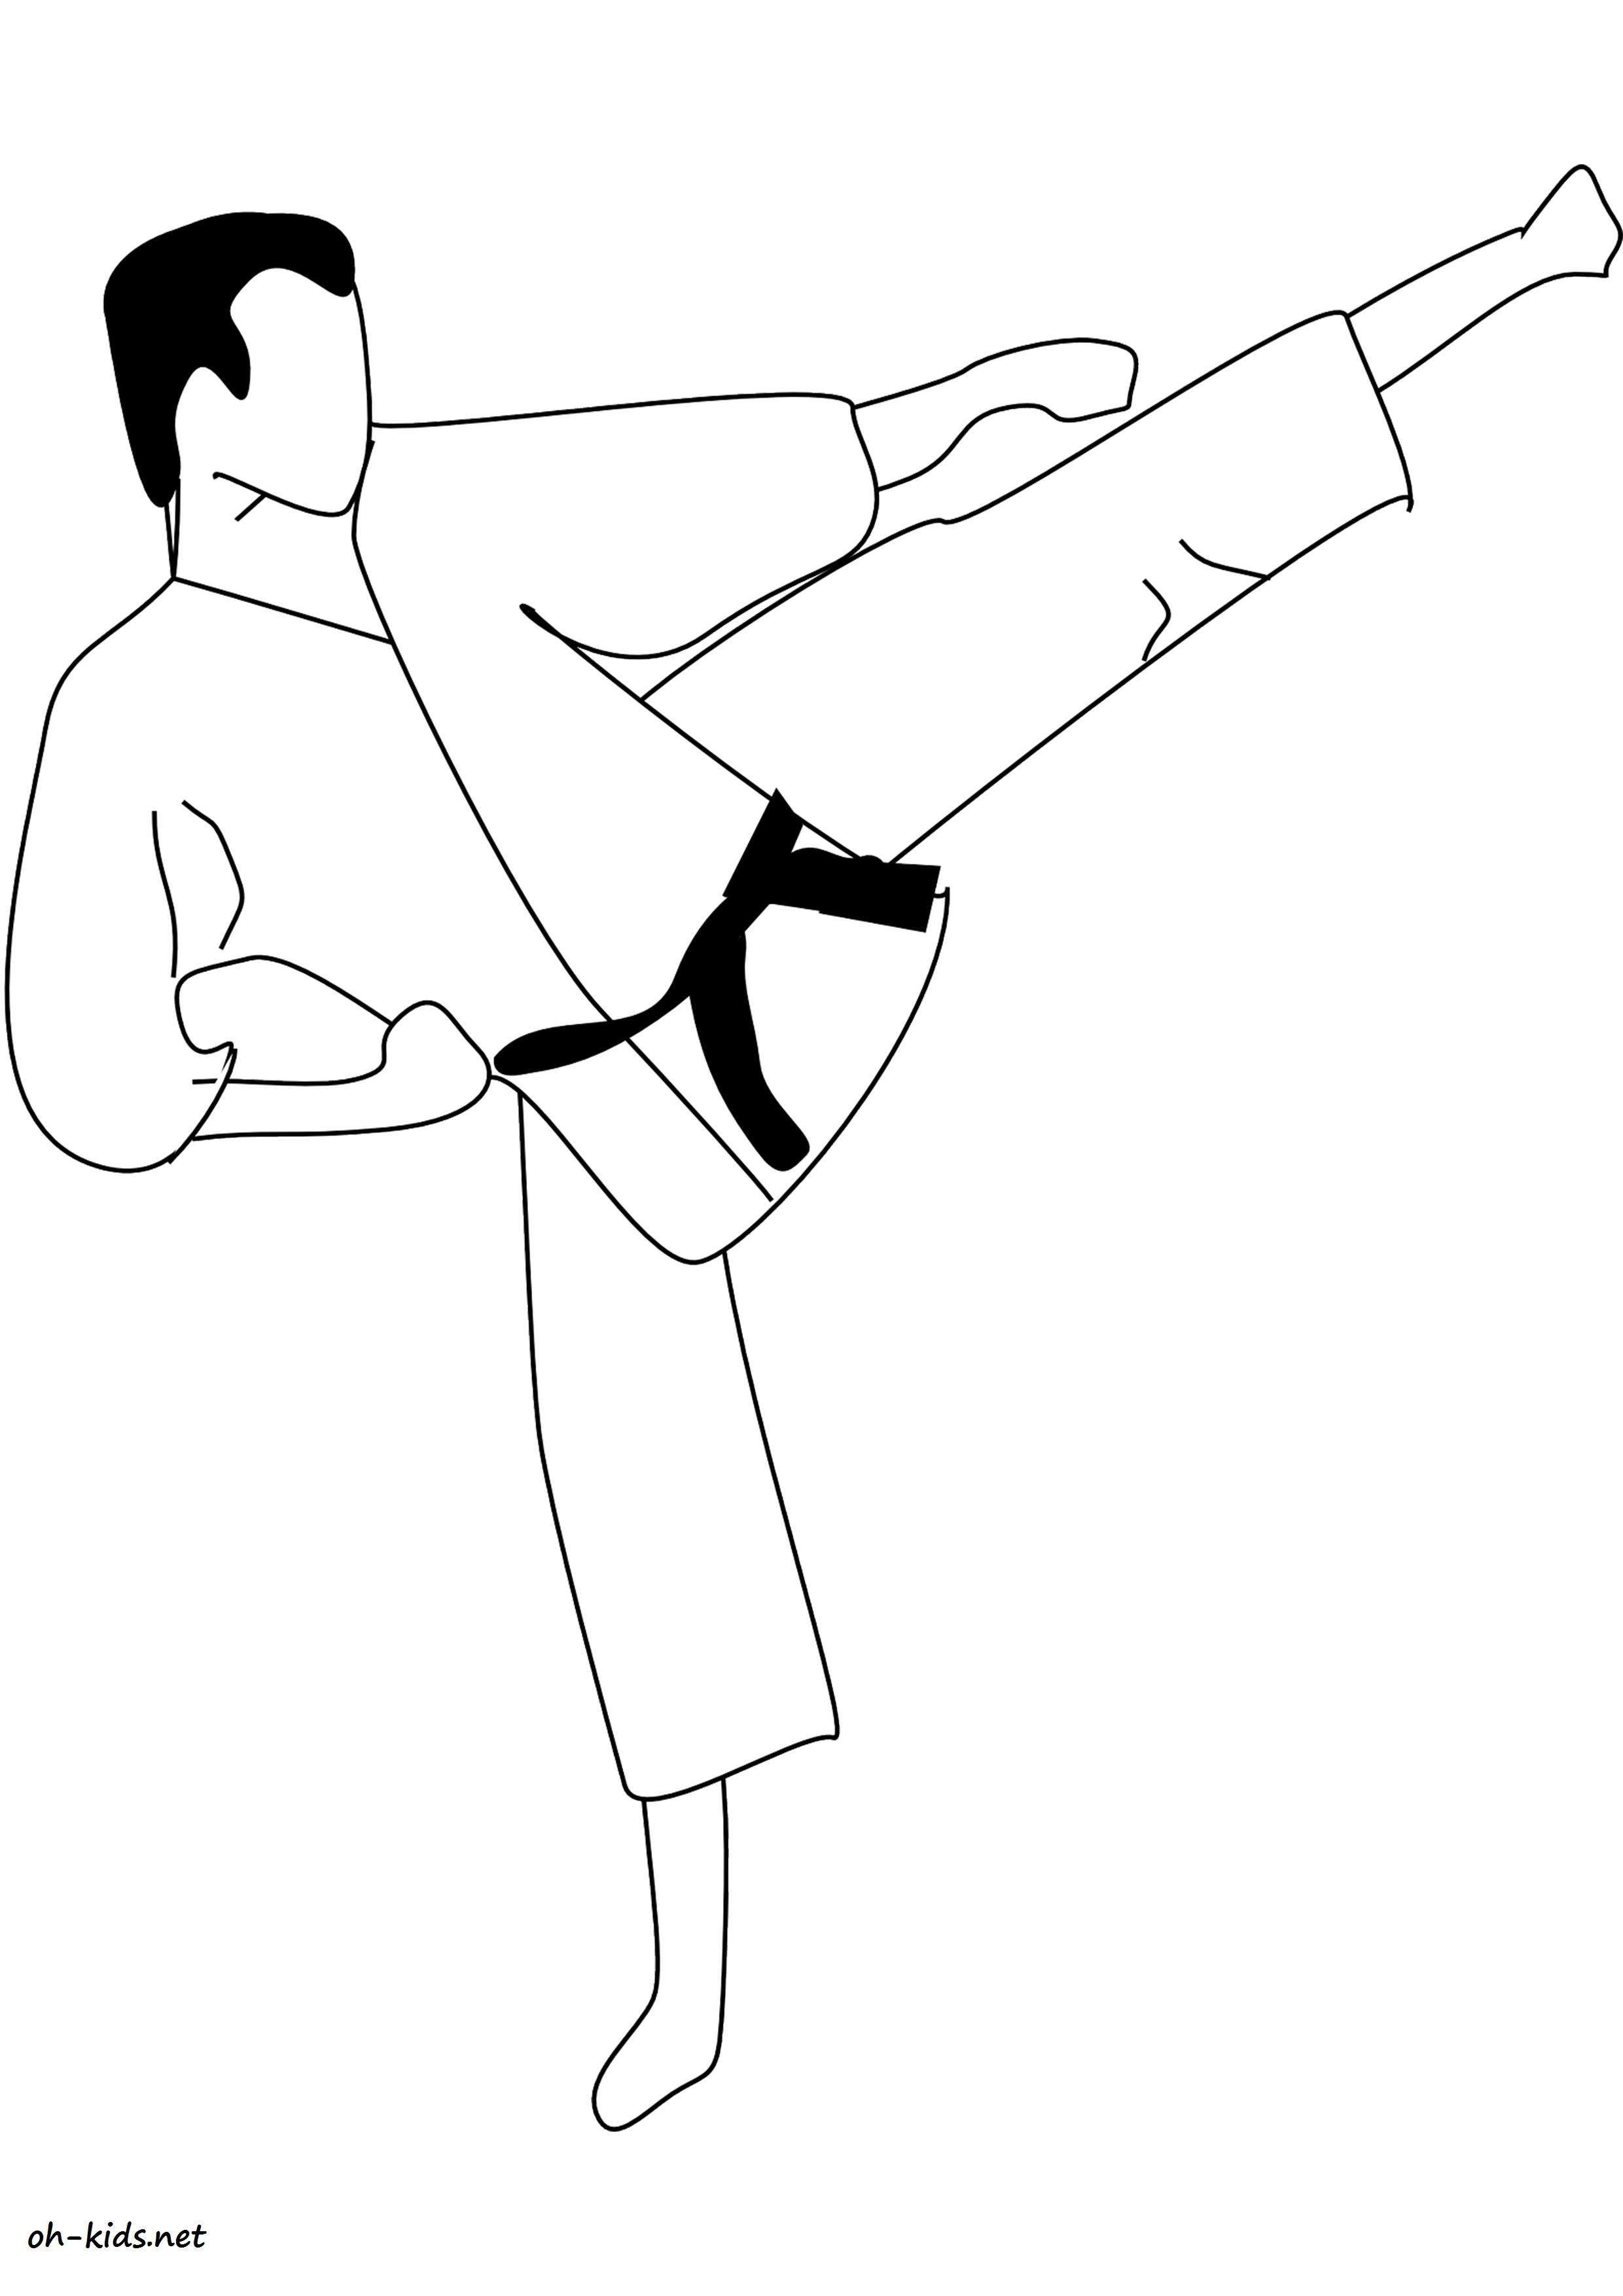 dessin gratuit de karate a colorier - Dessin #1389